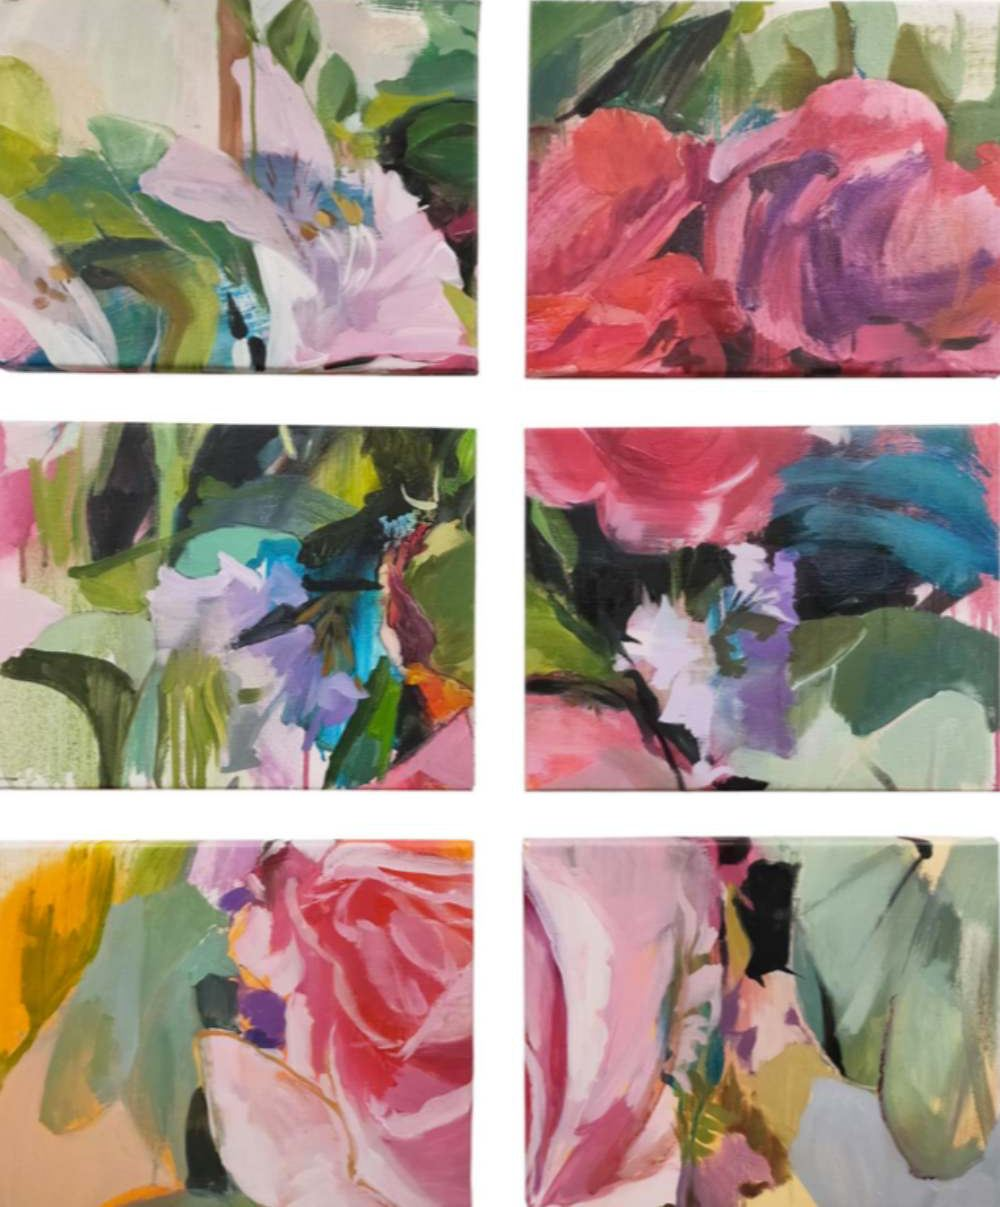 Octubre. Óleo/lienzo. 6 ud. 27 x 35 cm LAURA NIETO   LUISA PITA  MUJERES MIRANDO MUJERES